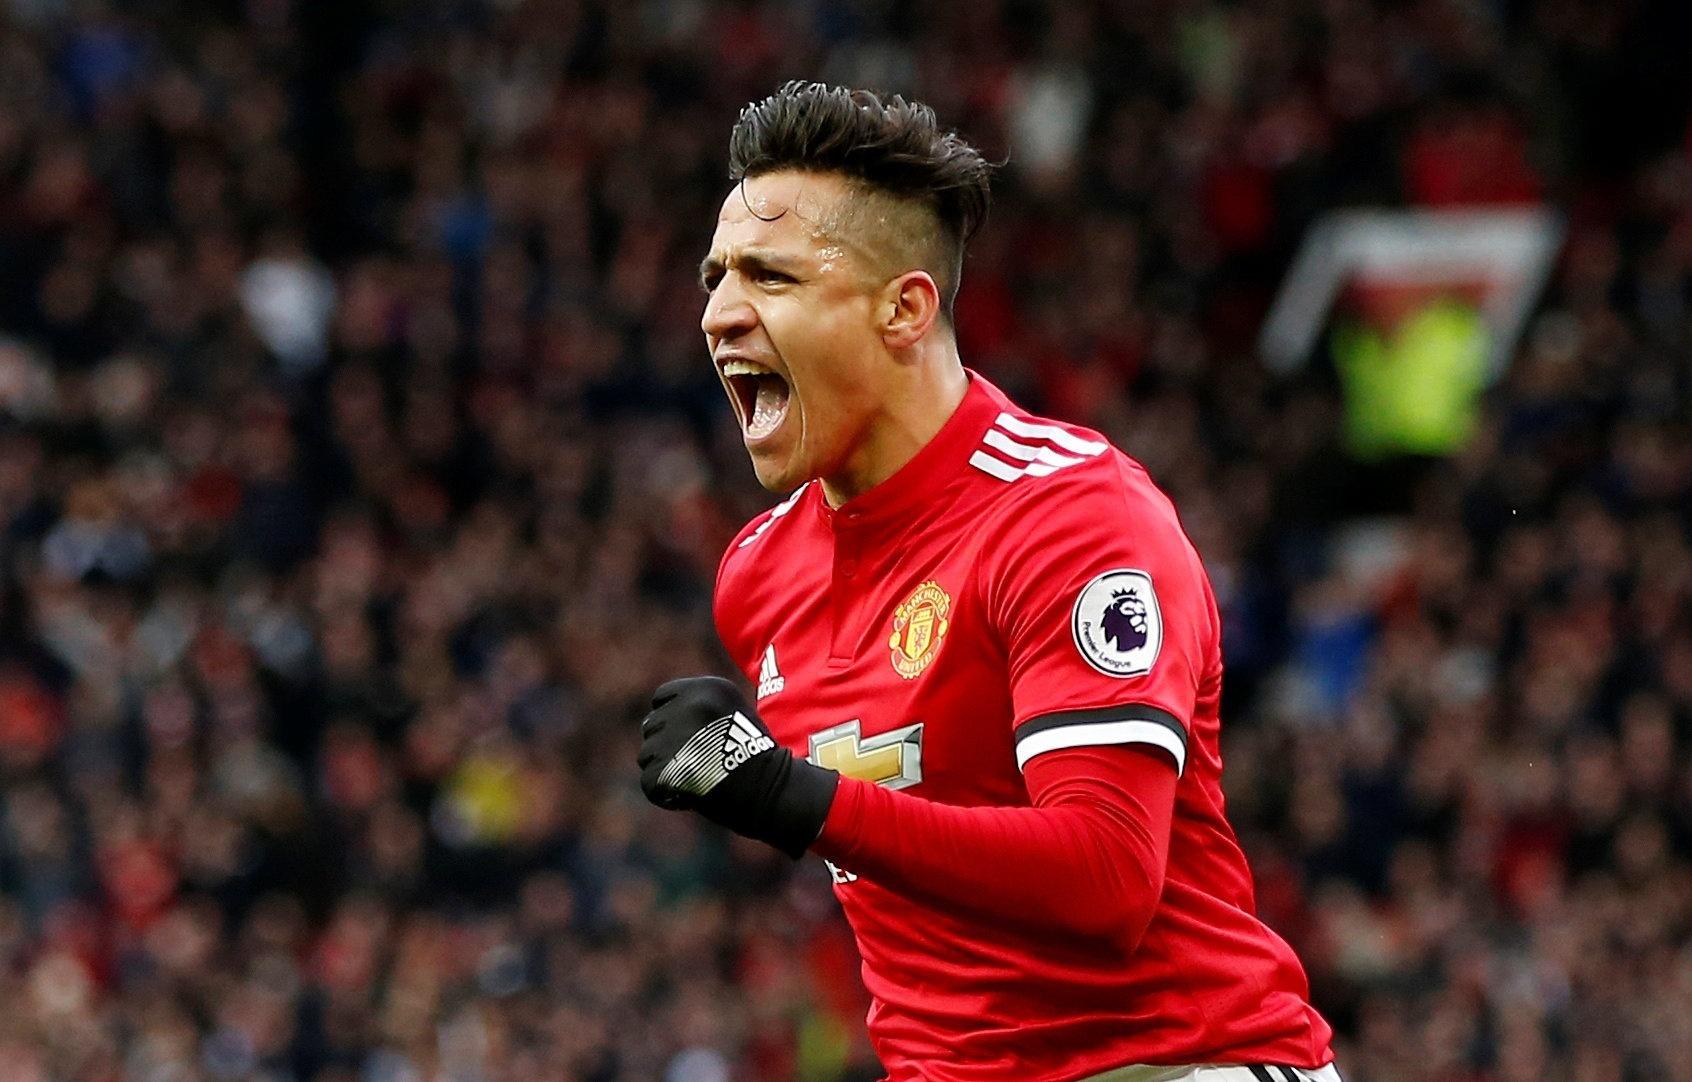 Sánchez festeja o segundo gol do Manchester United contra o Swansea